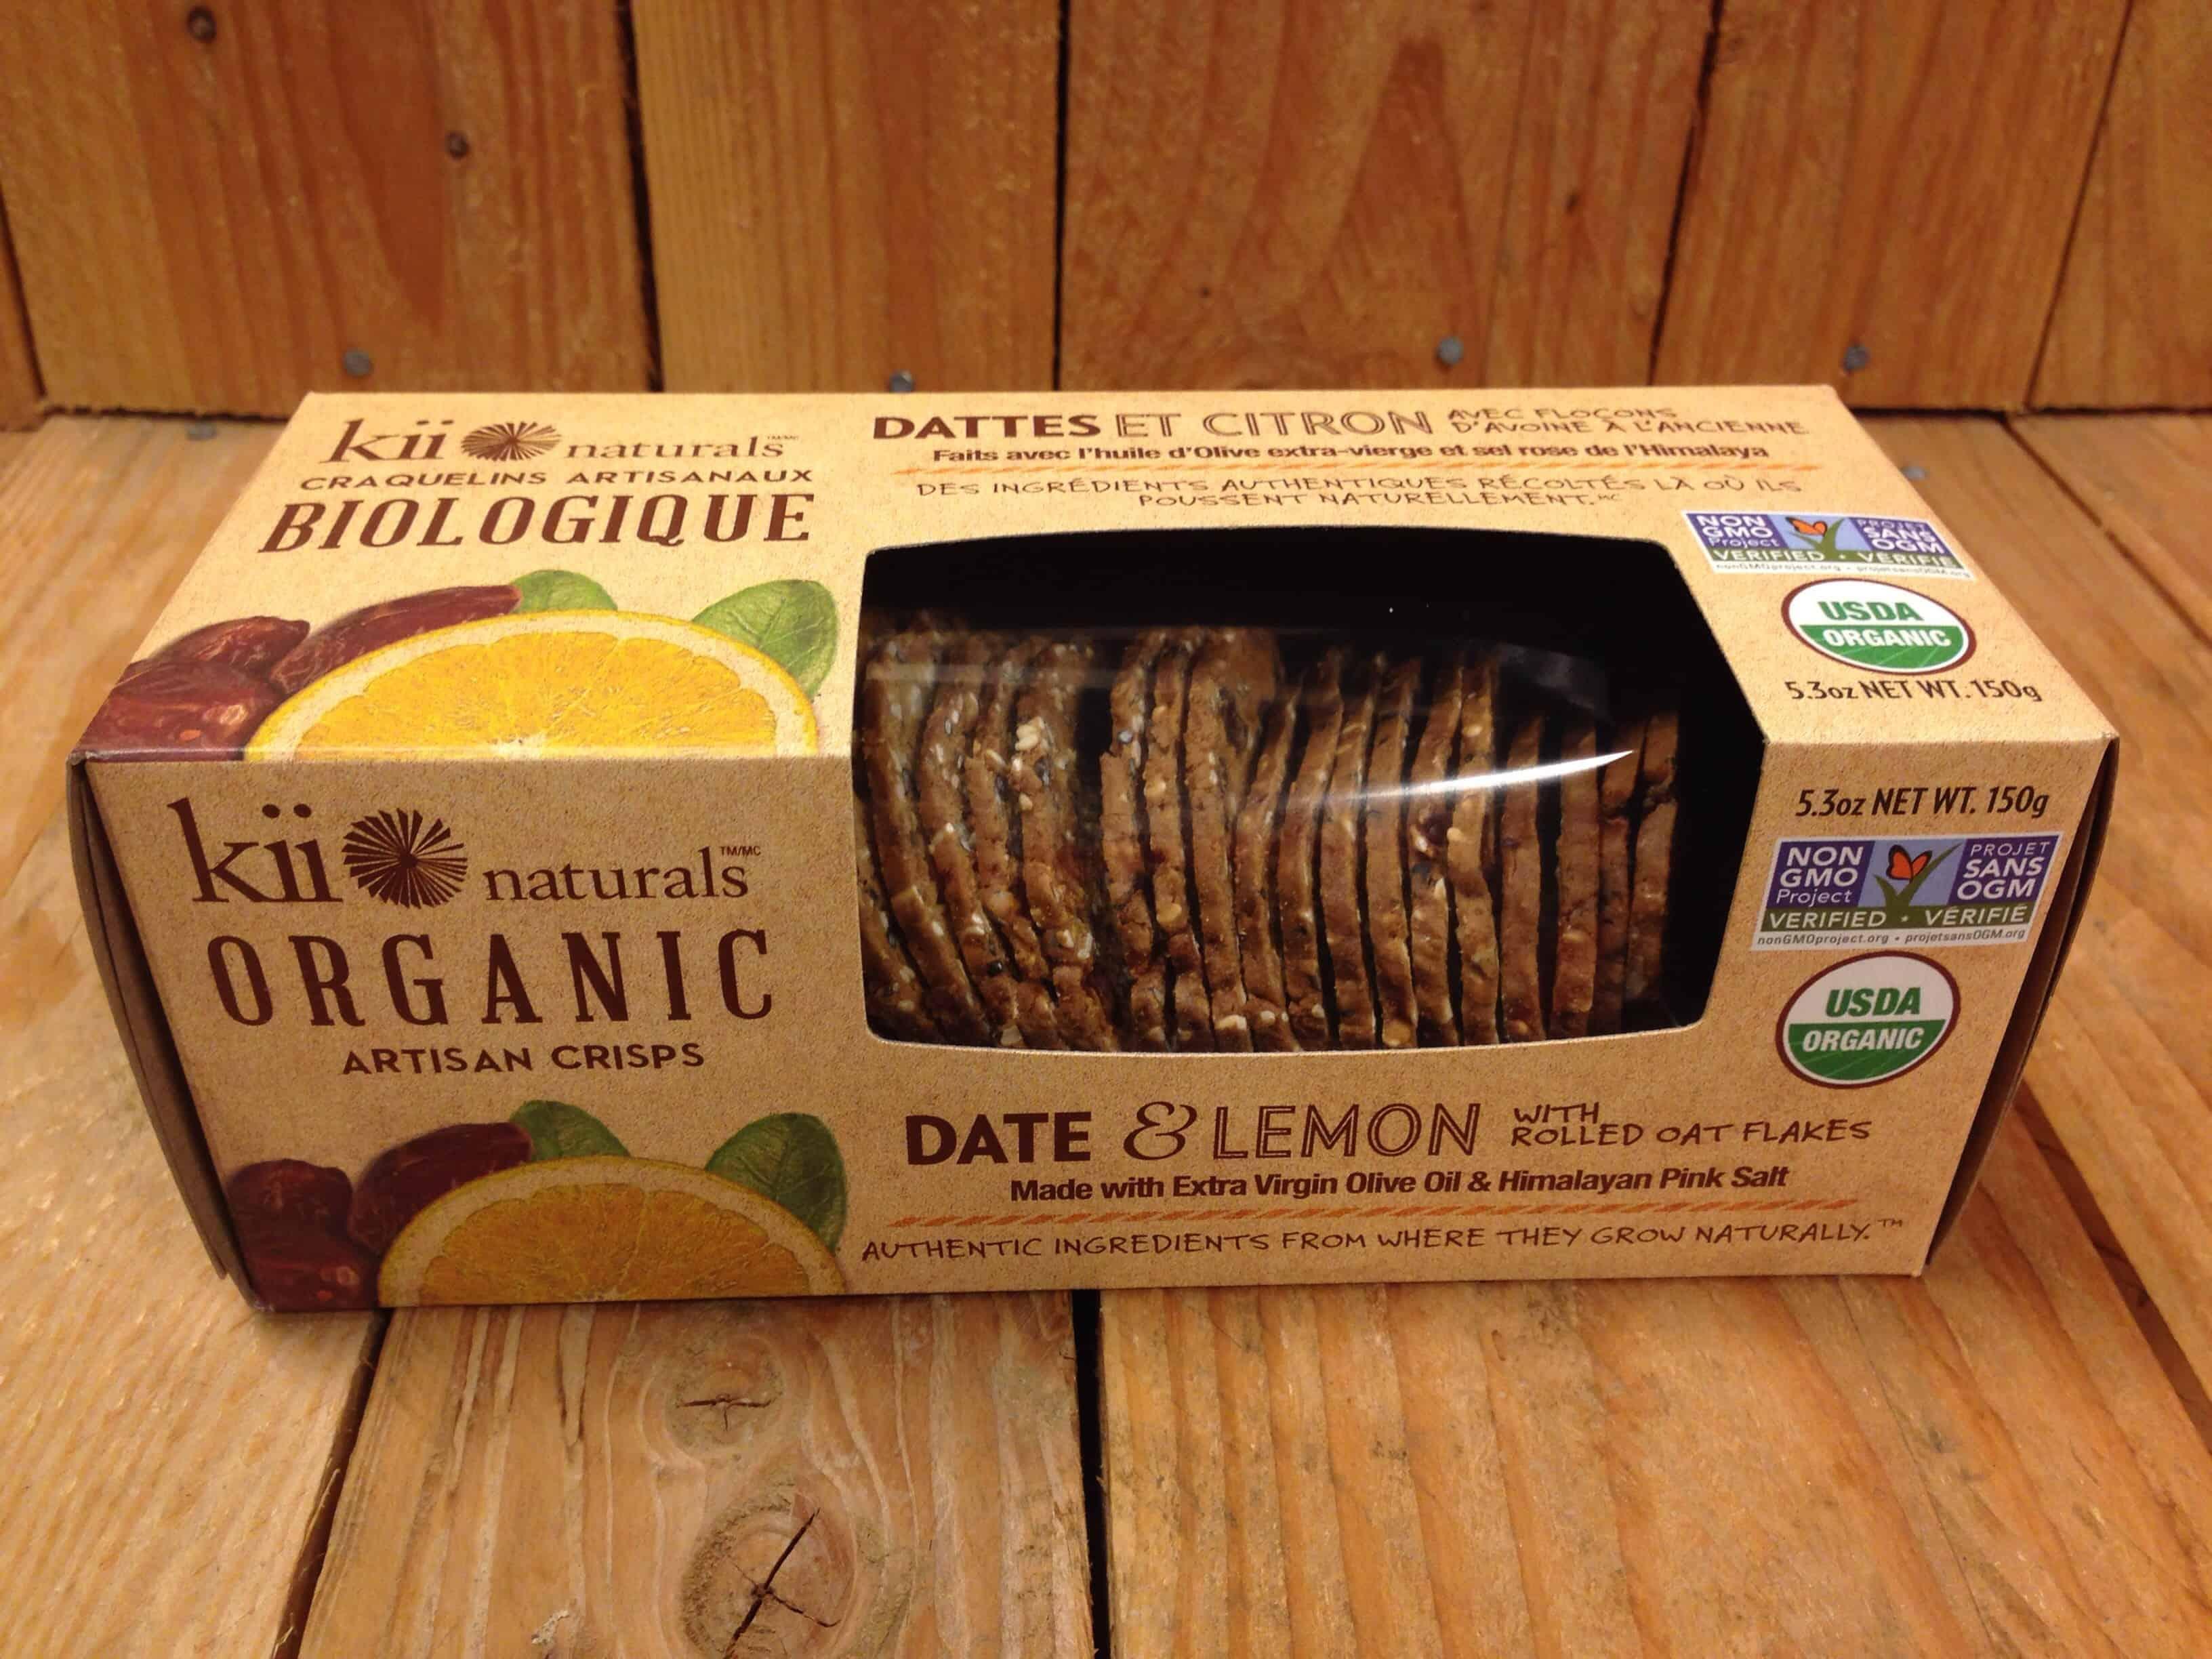 Kii Naturals – Date & Lemon Artisan Crisps (150g)